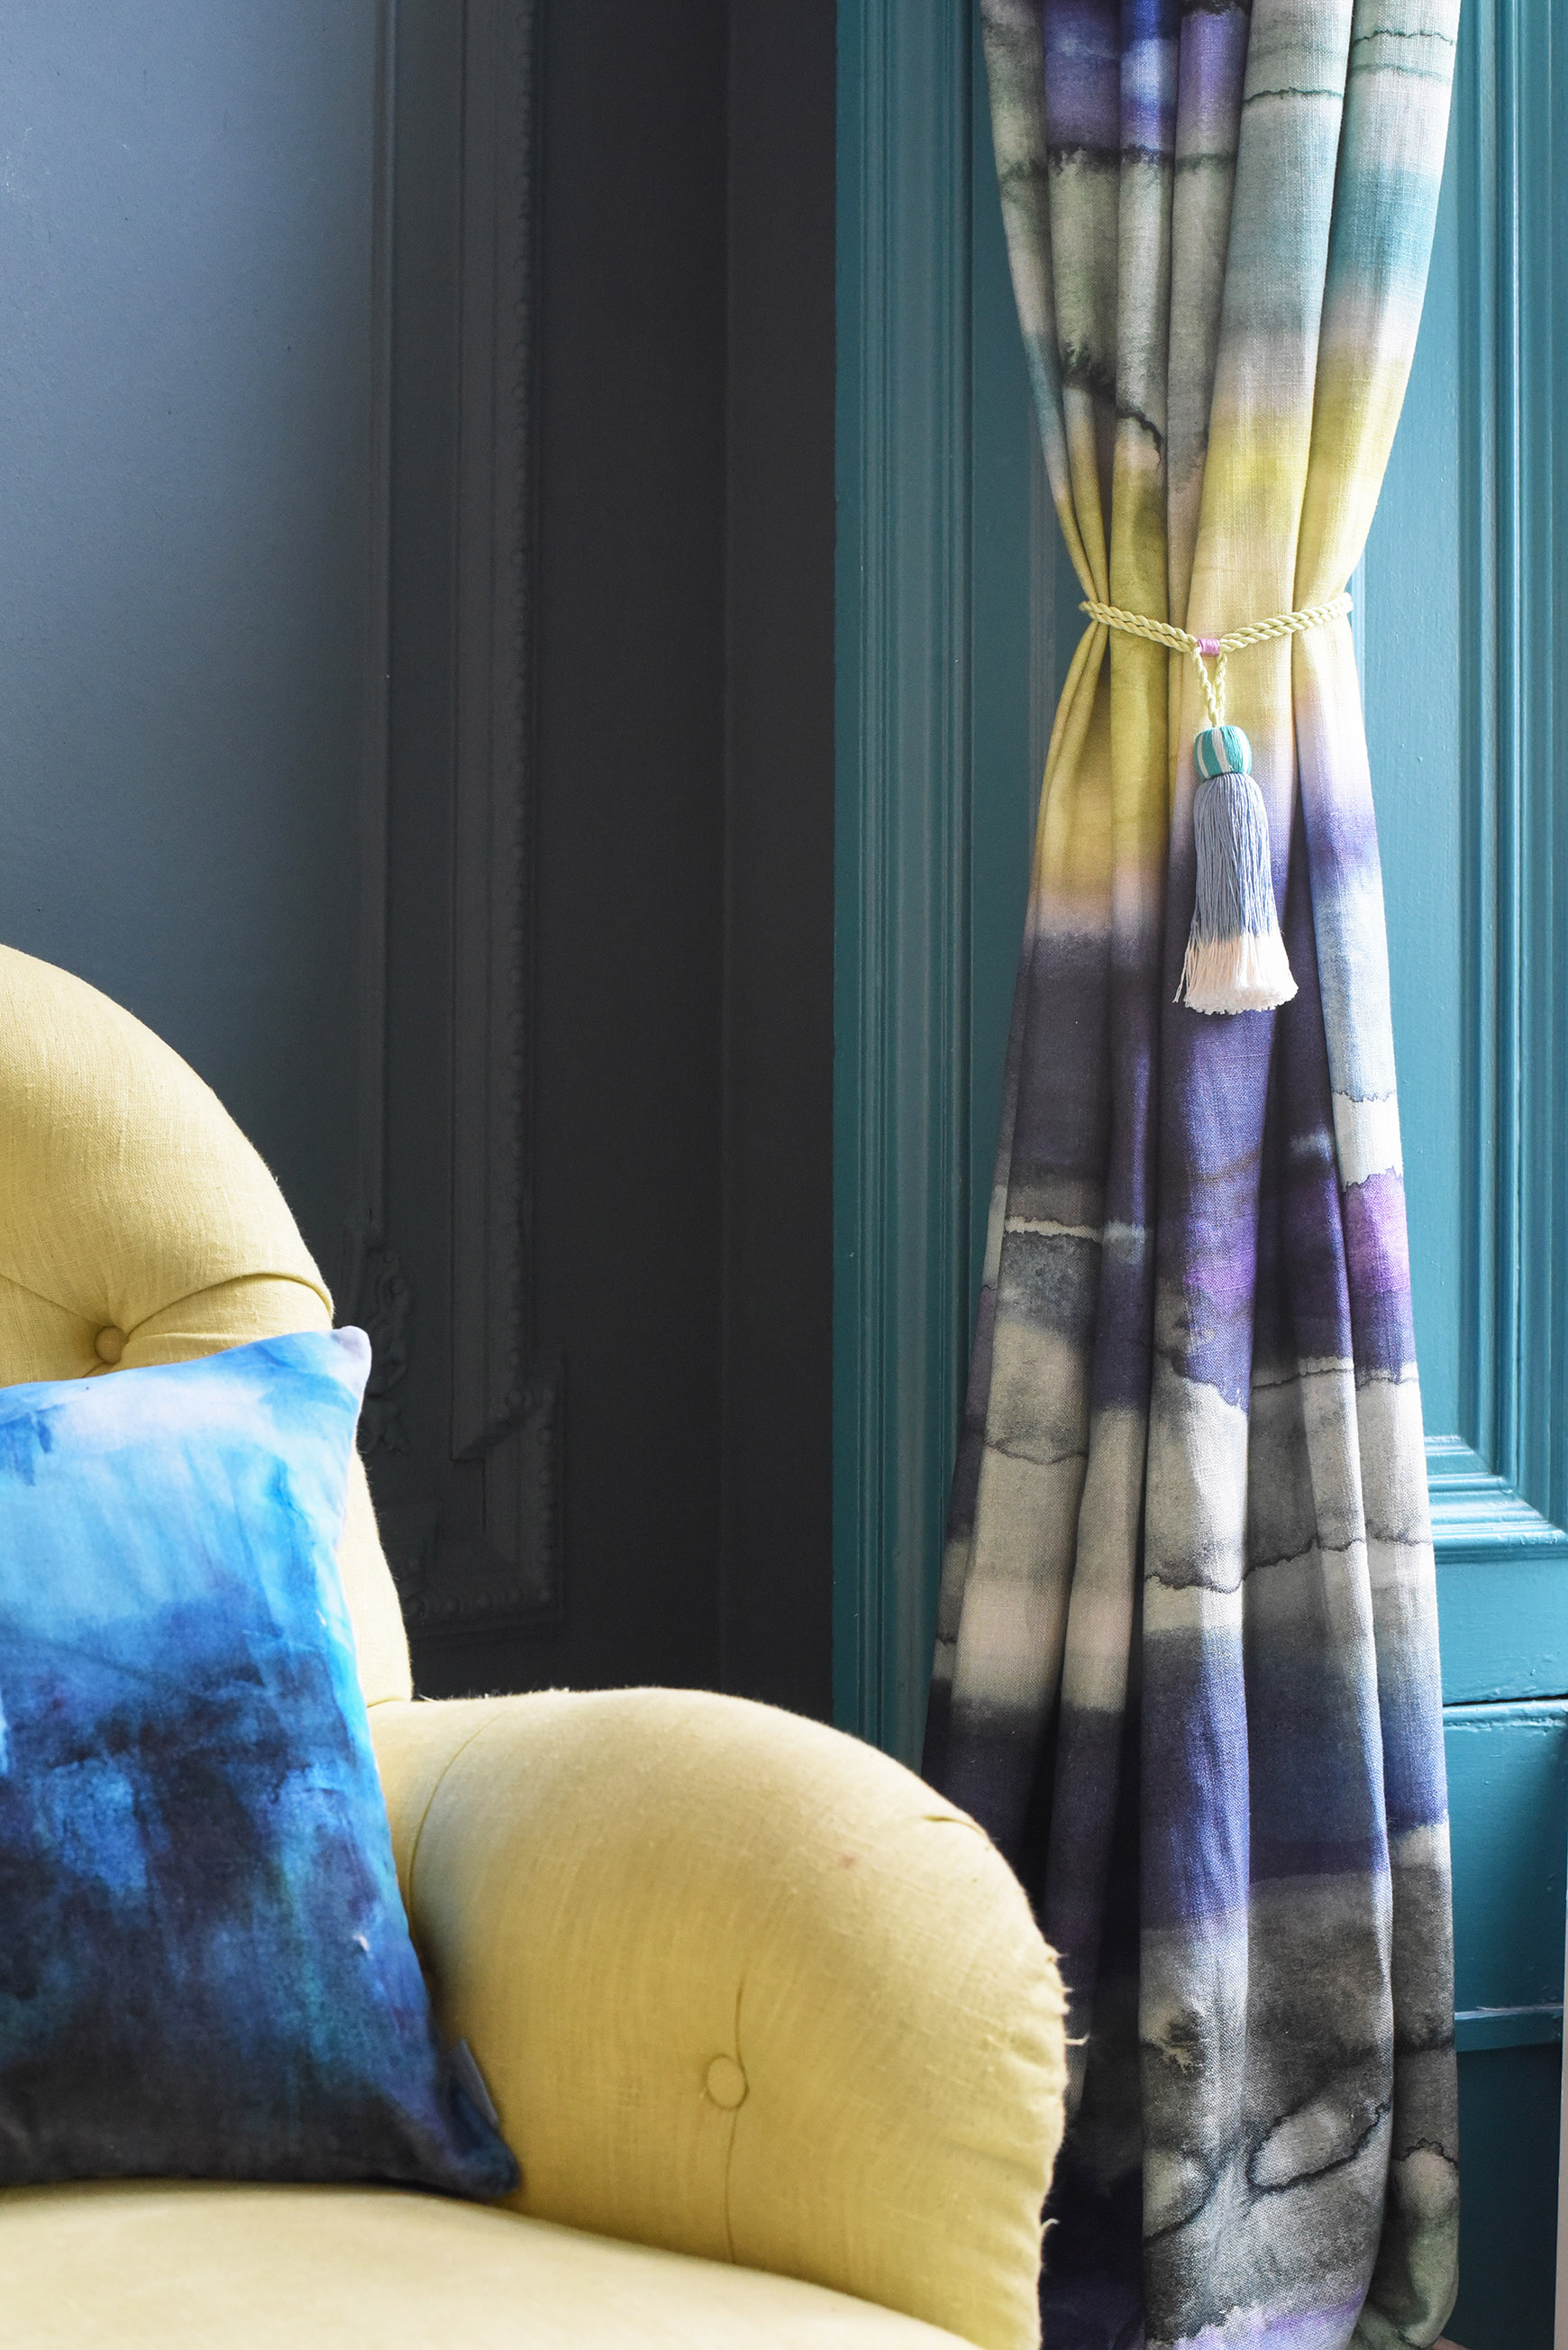 Morar linen fabric, bluebellgray